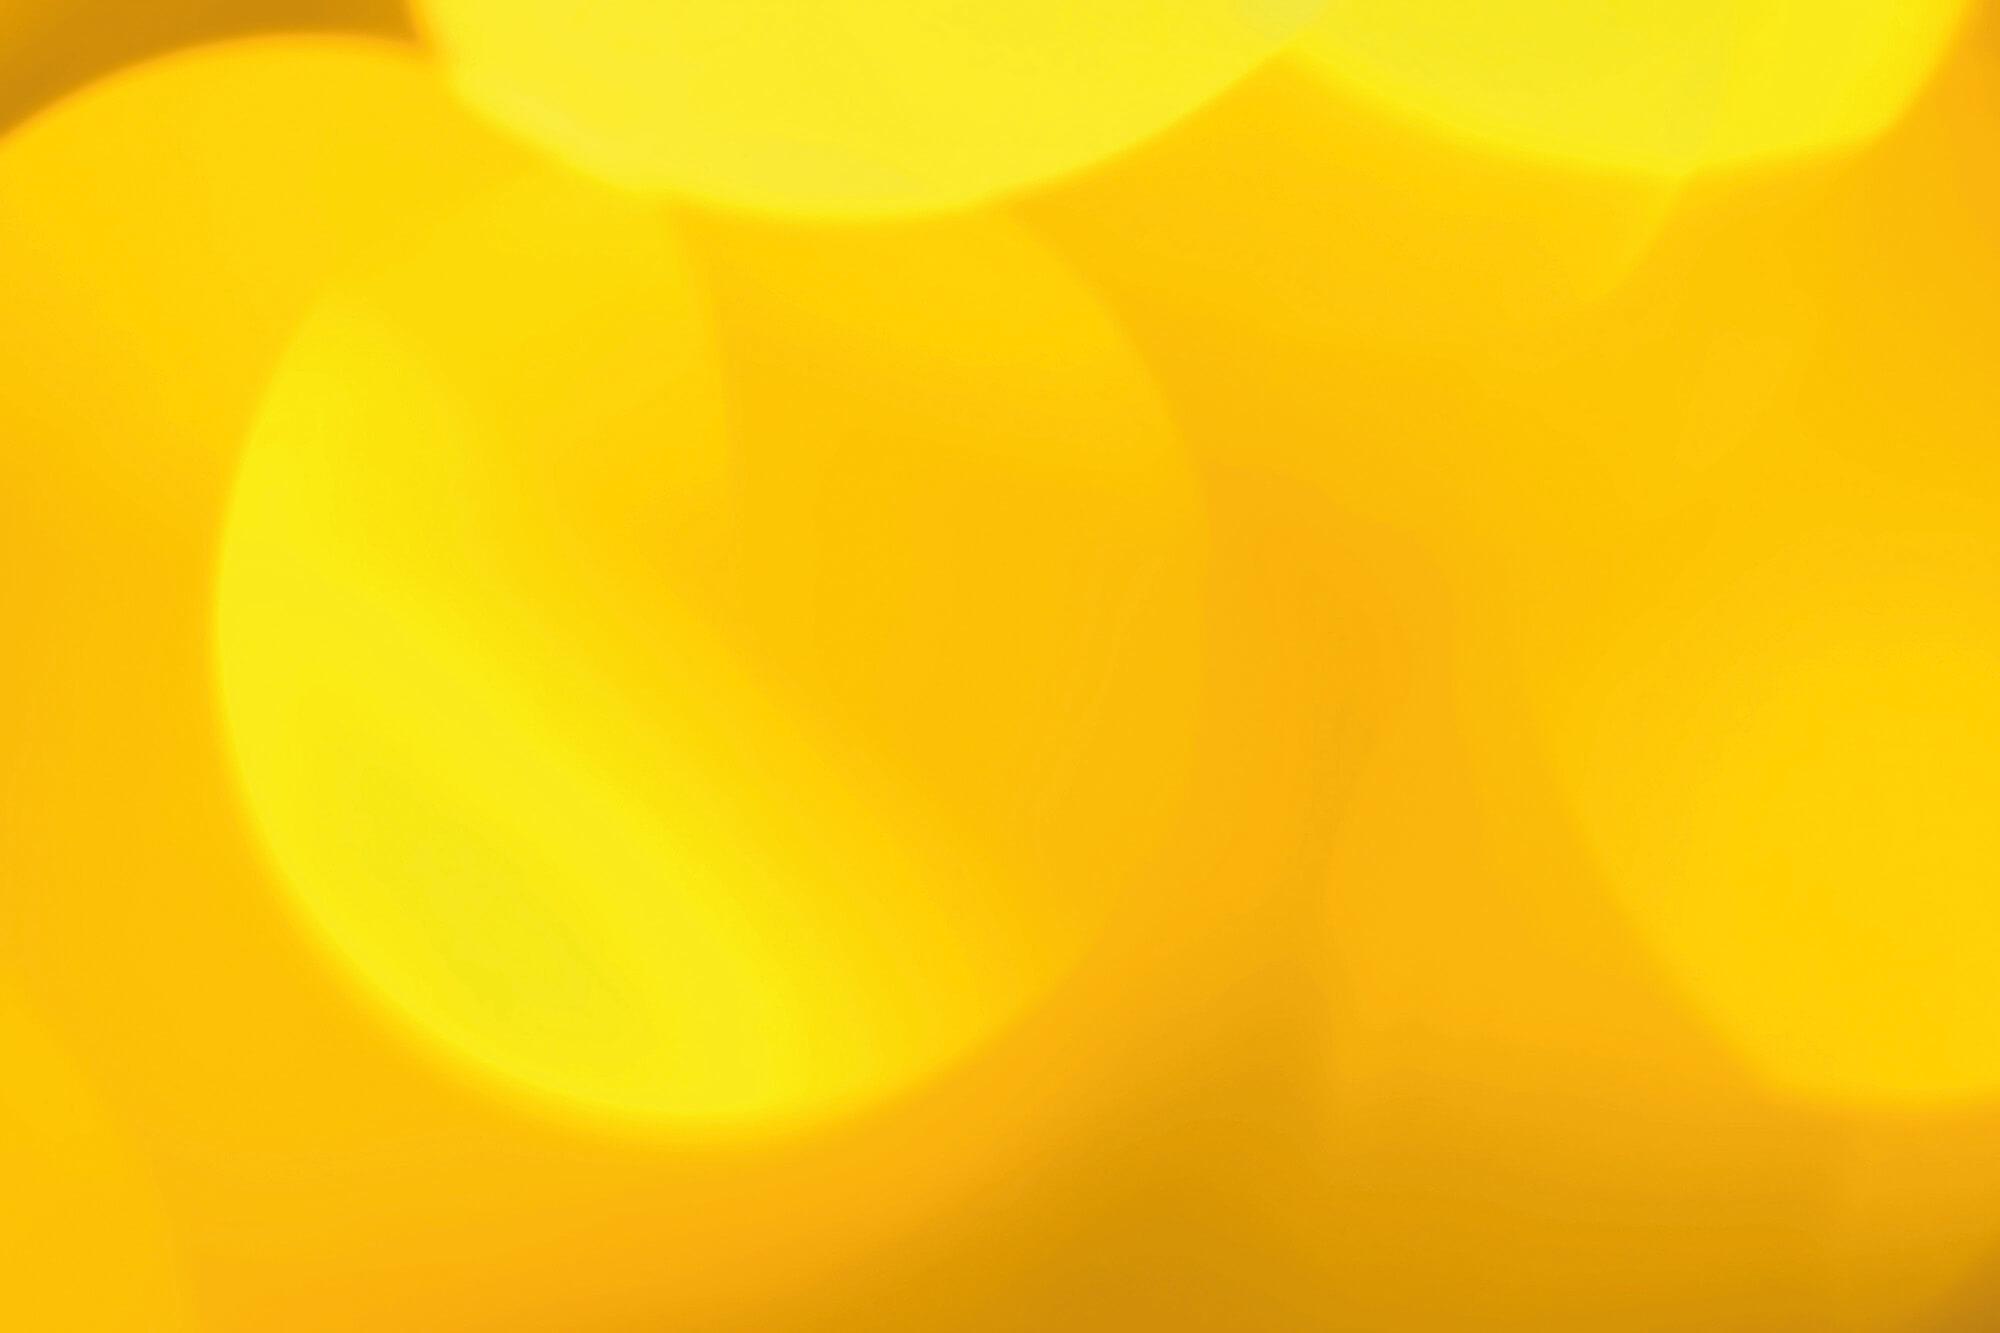 L&Q yellow textured brand image